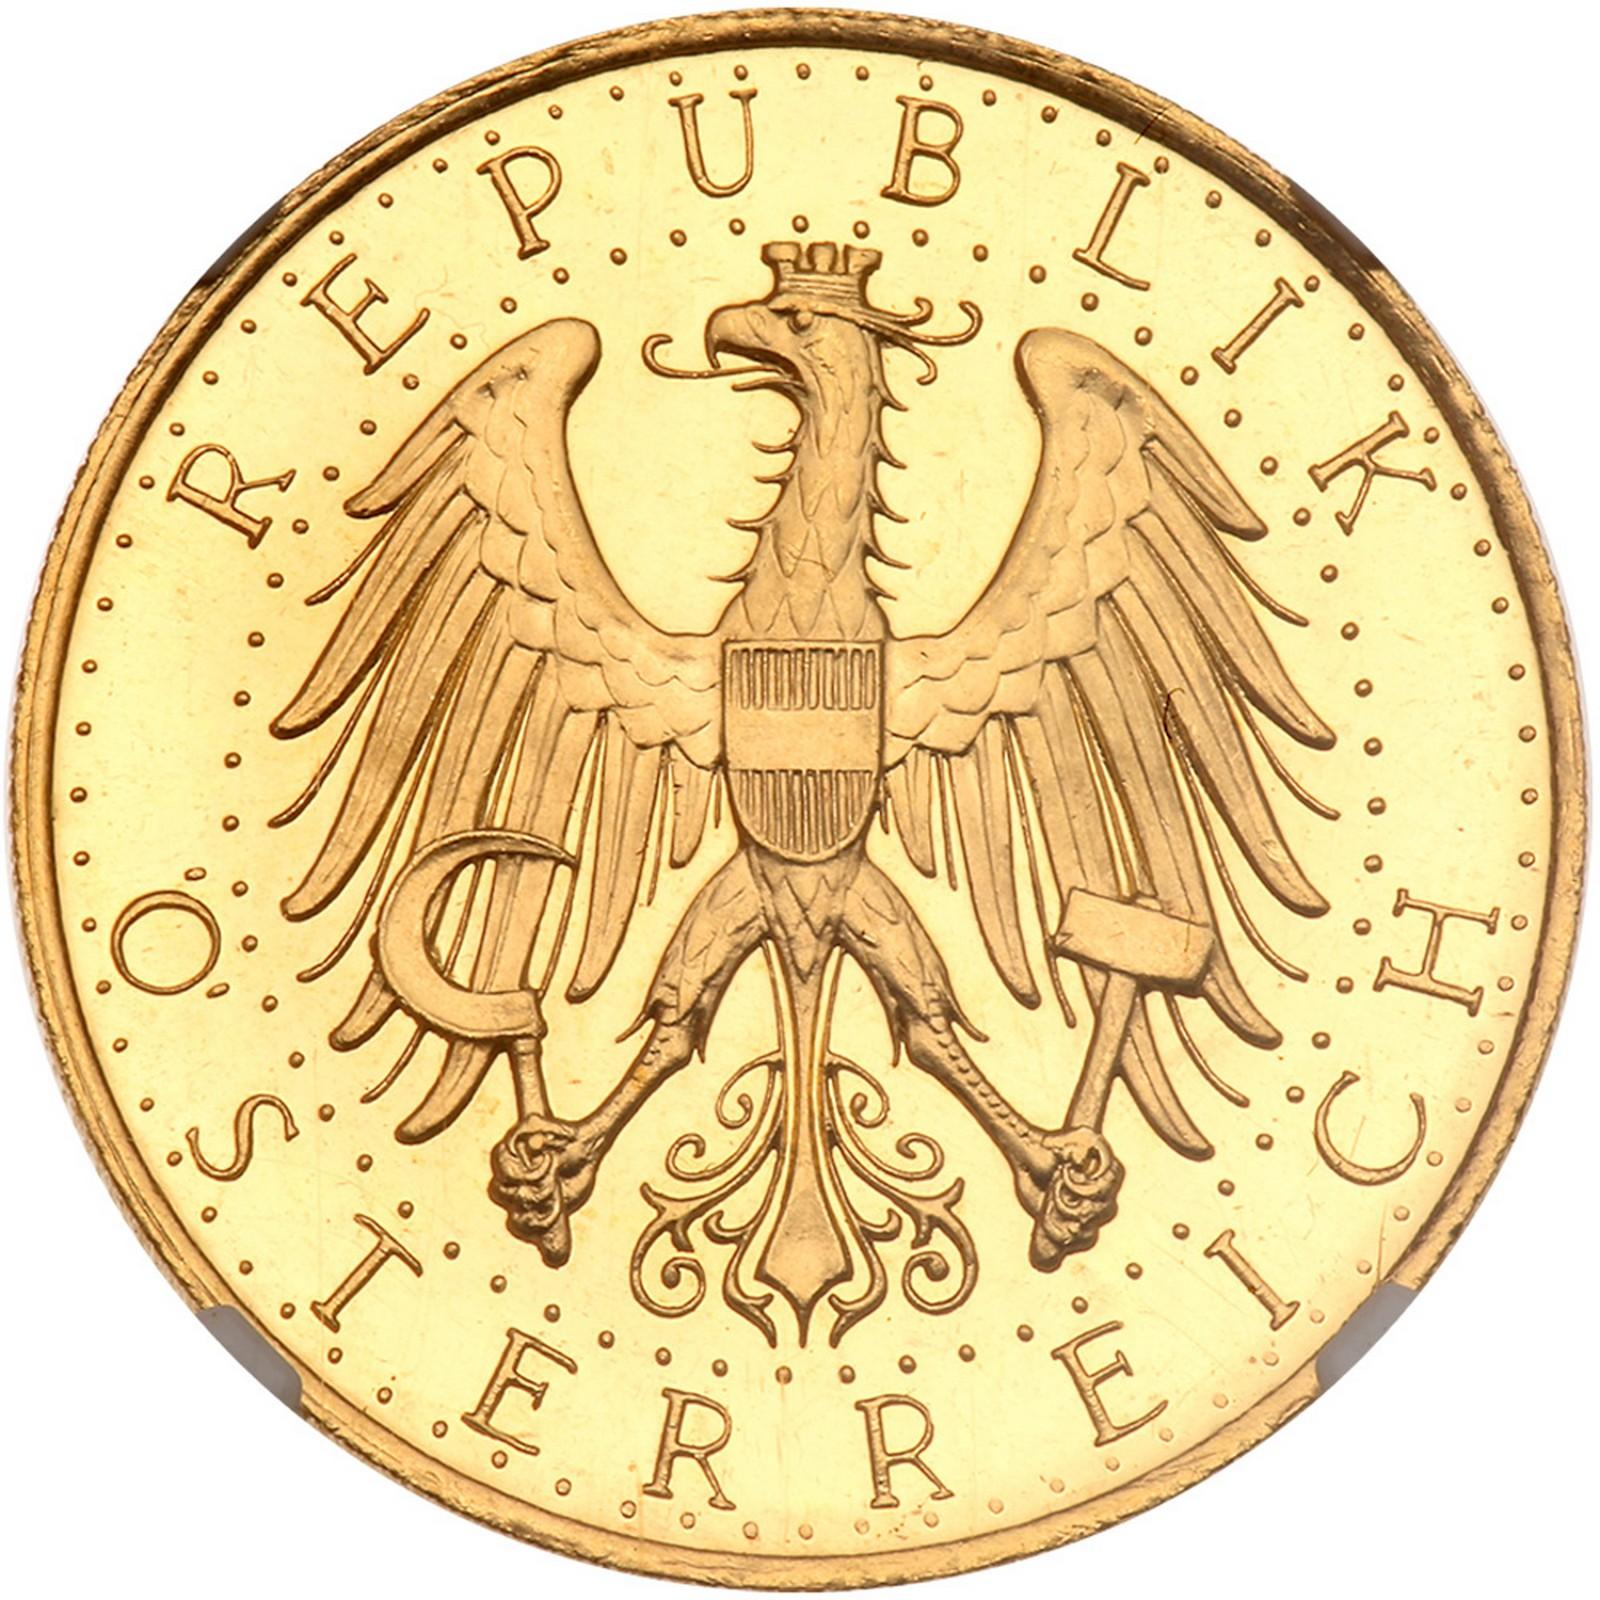 Original 1915 Austrian 100 Corona Value